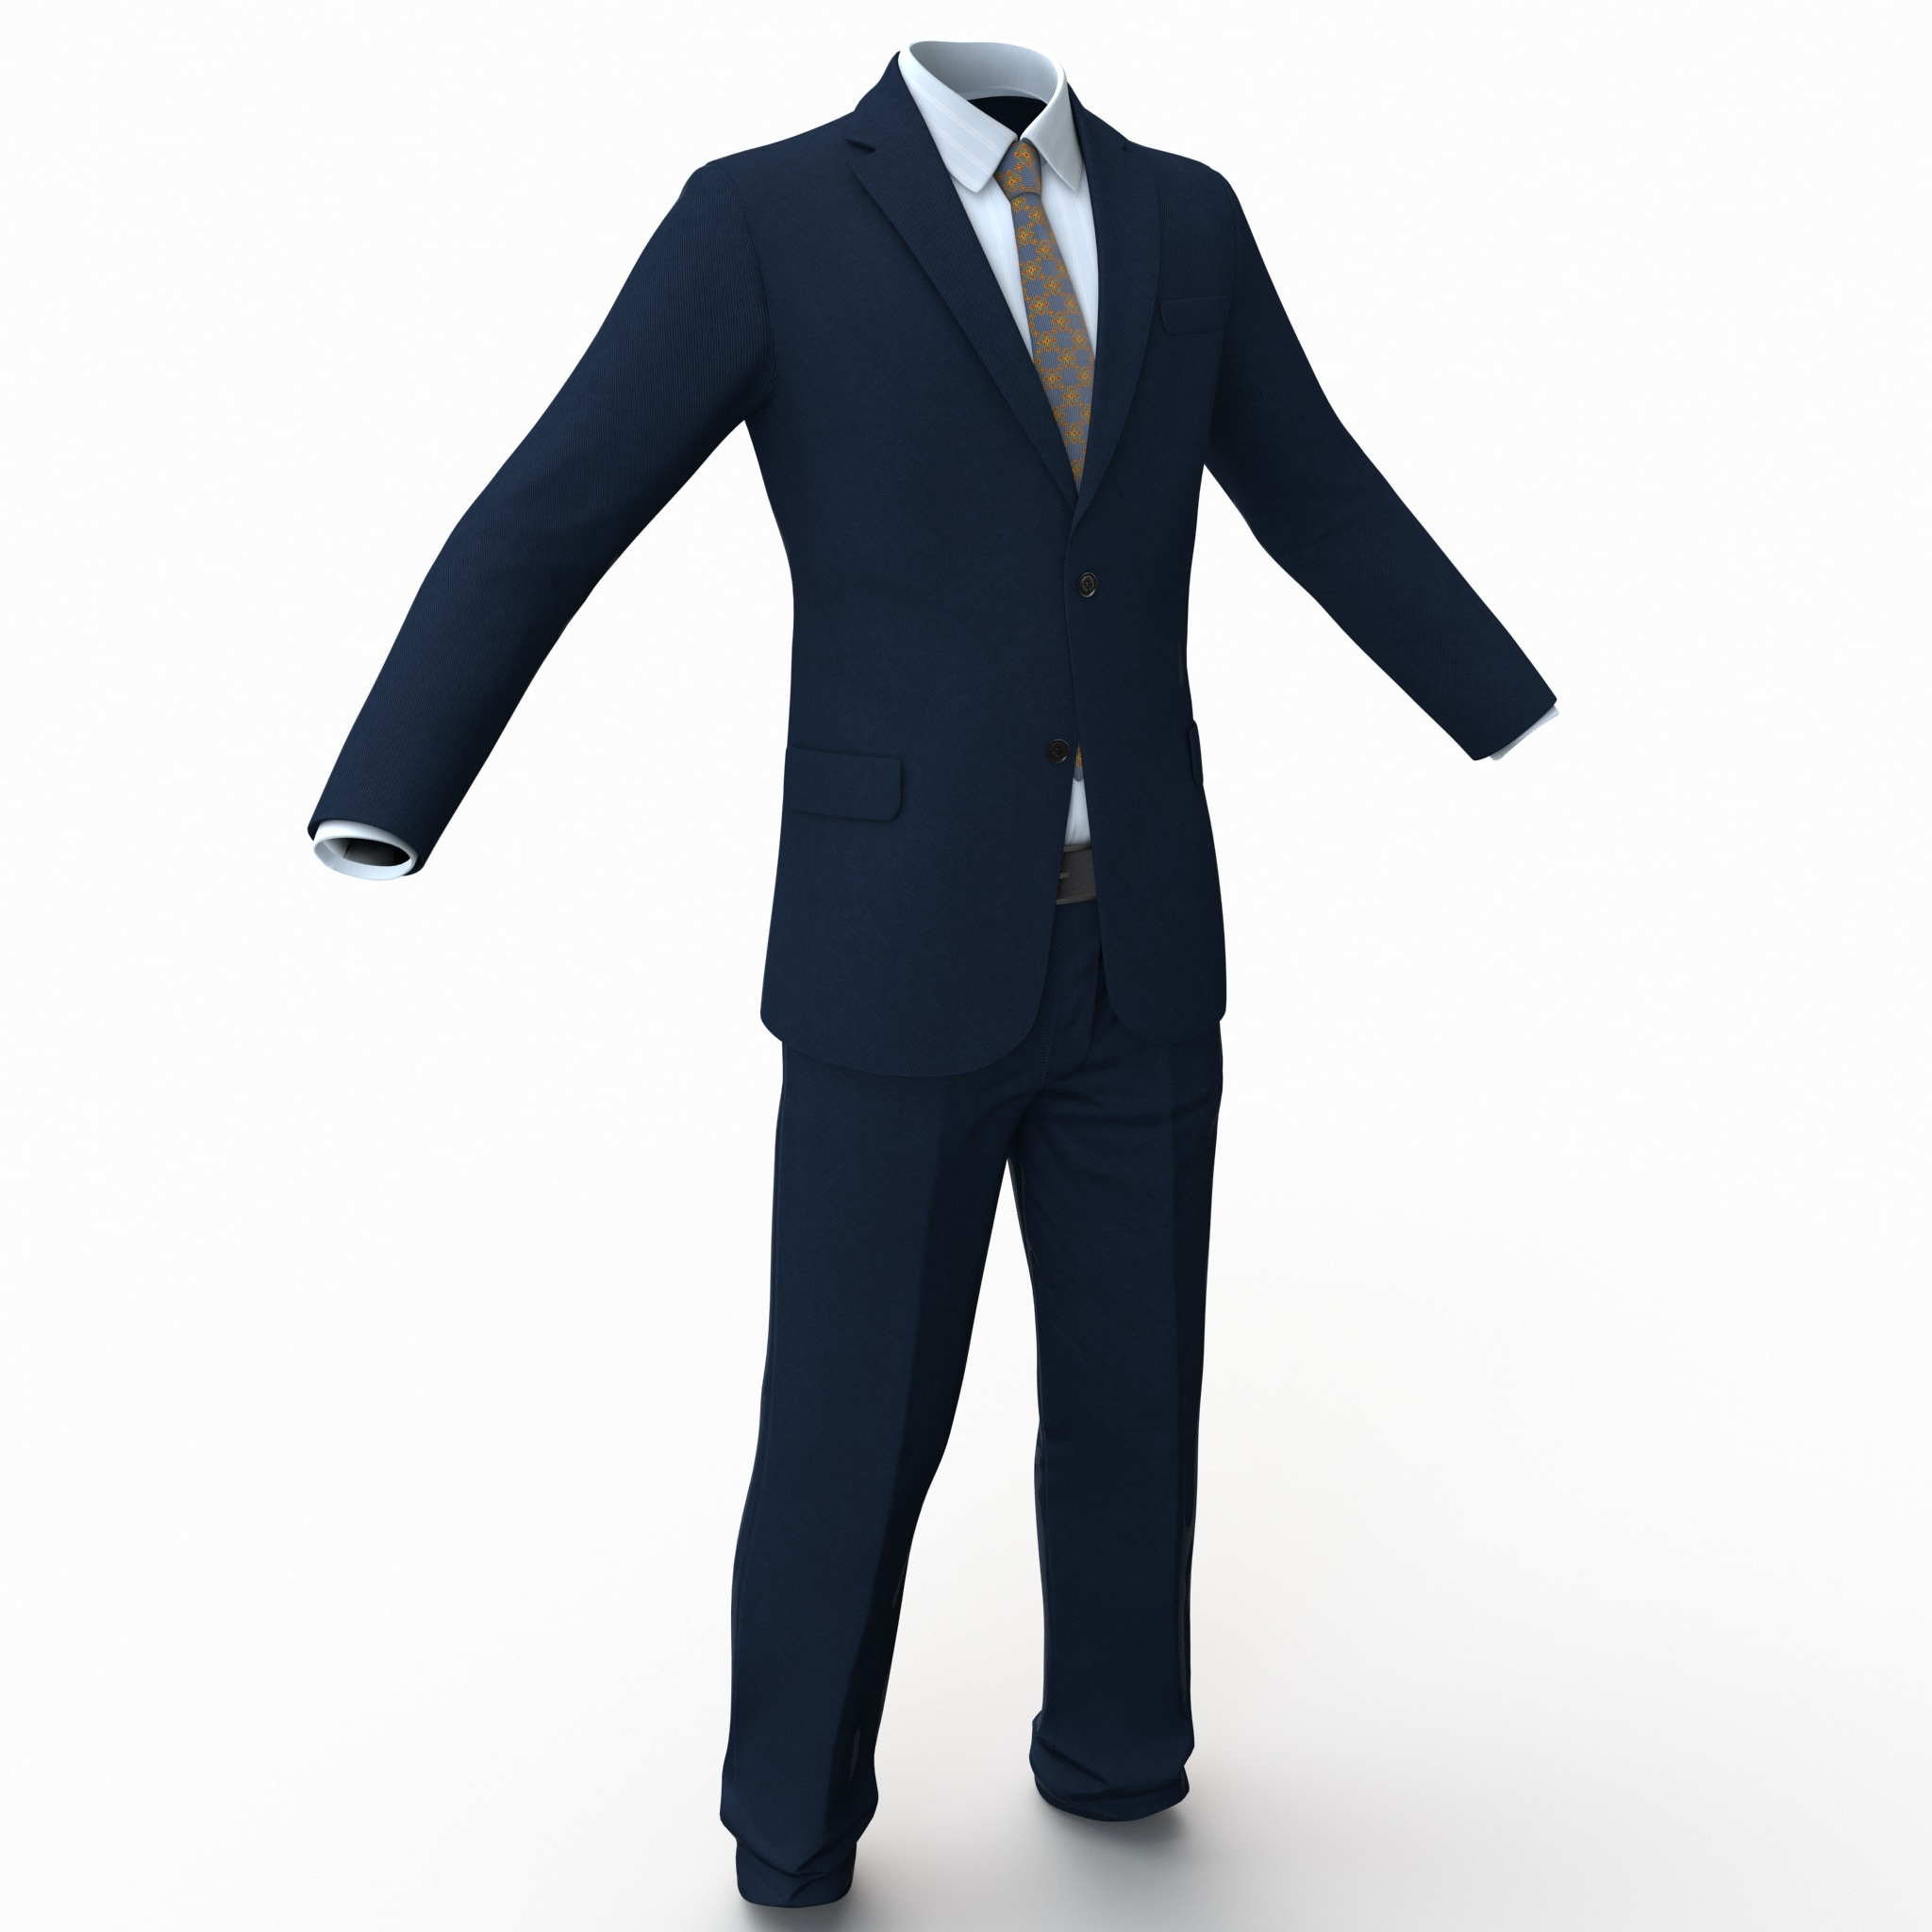 Suit 2_2.jpg